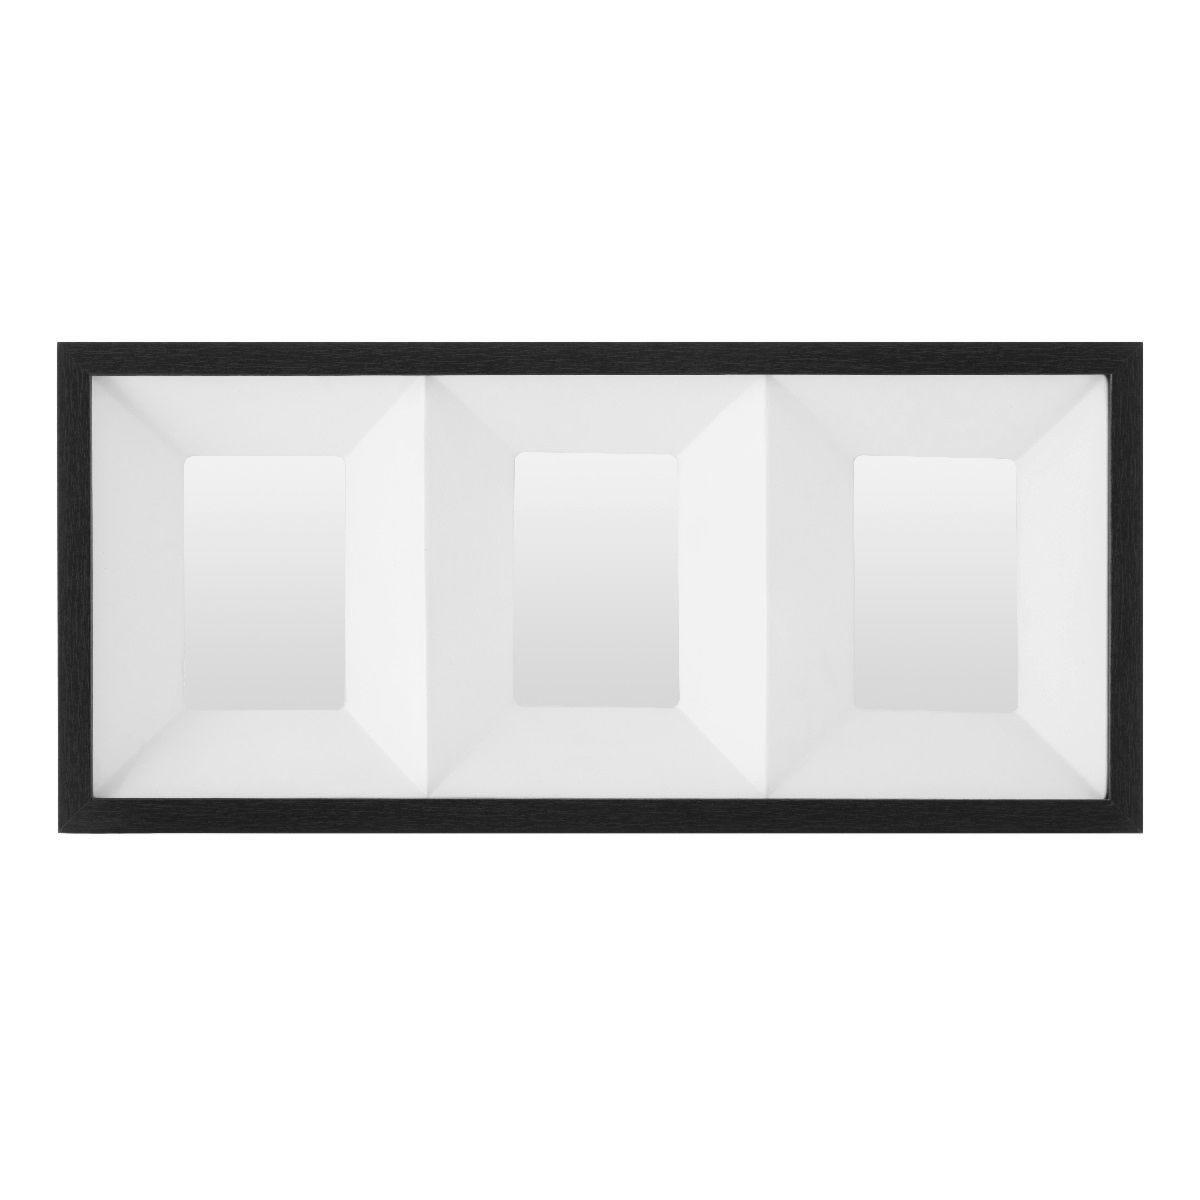 Premier Housewares Collage Photo Frame 3D Box Design - Black